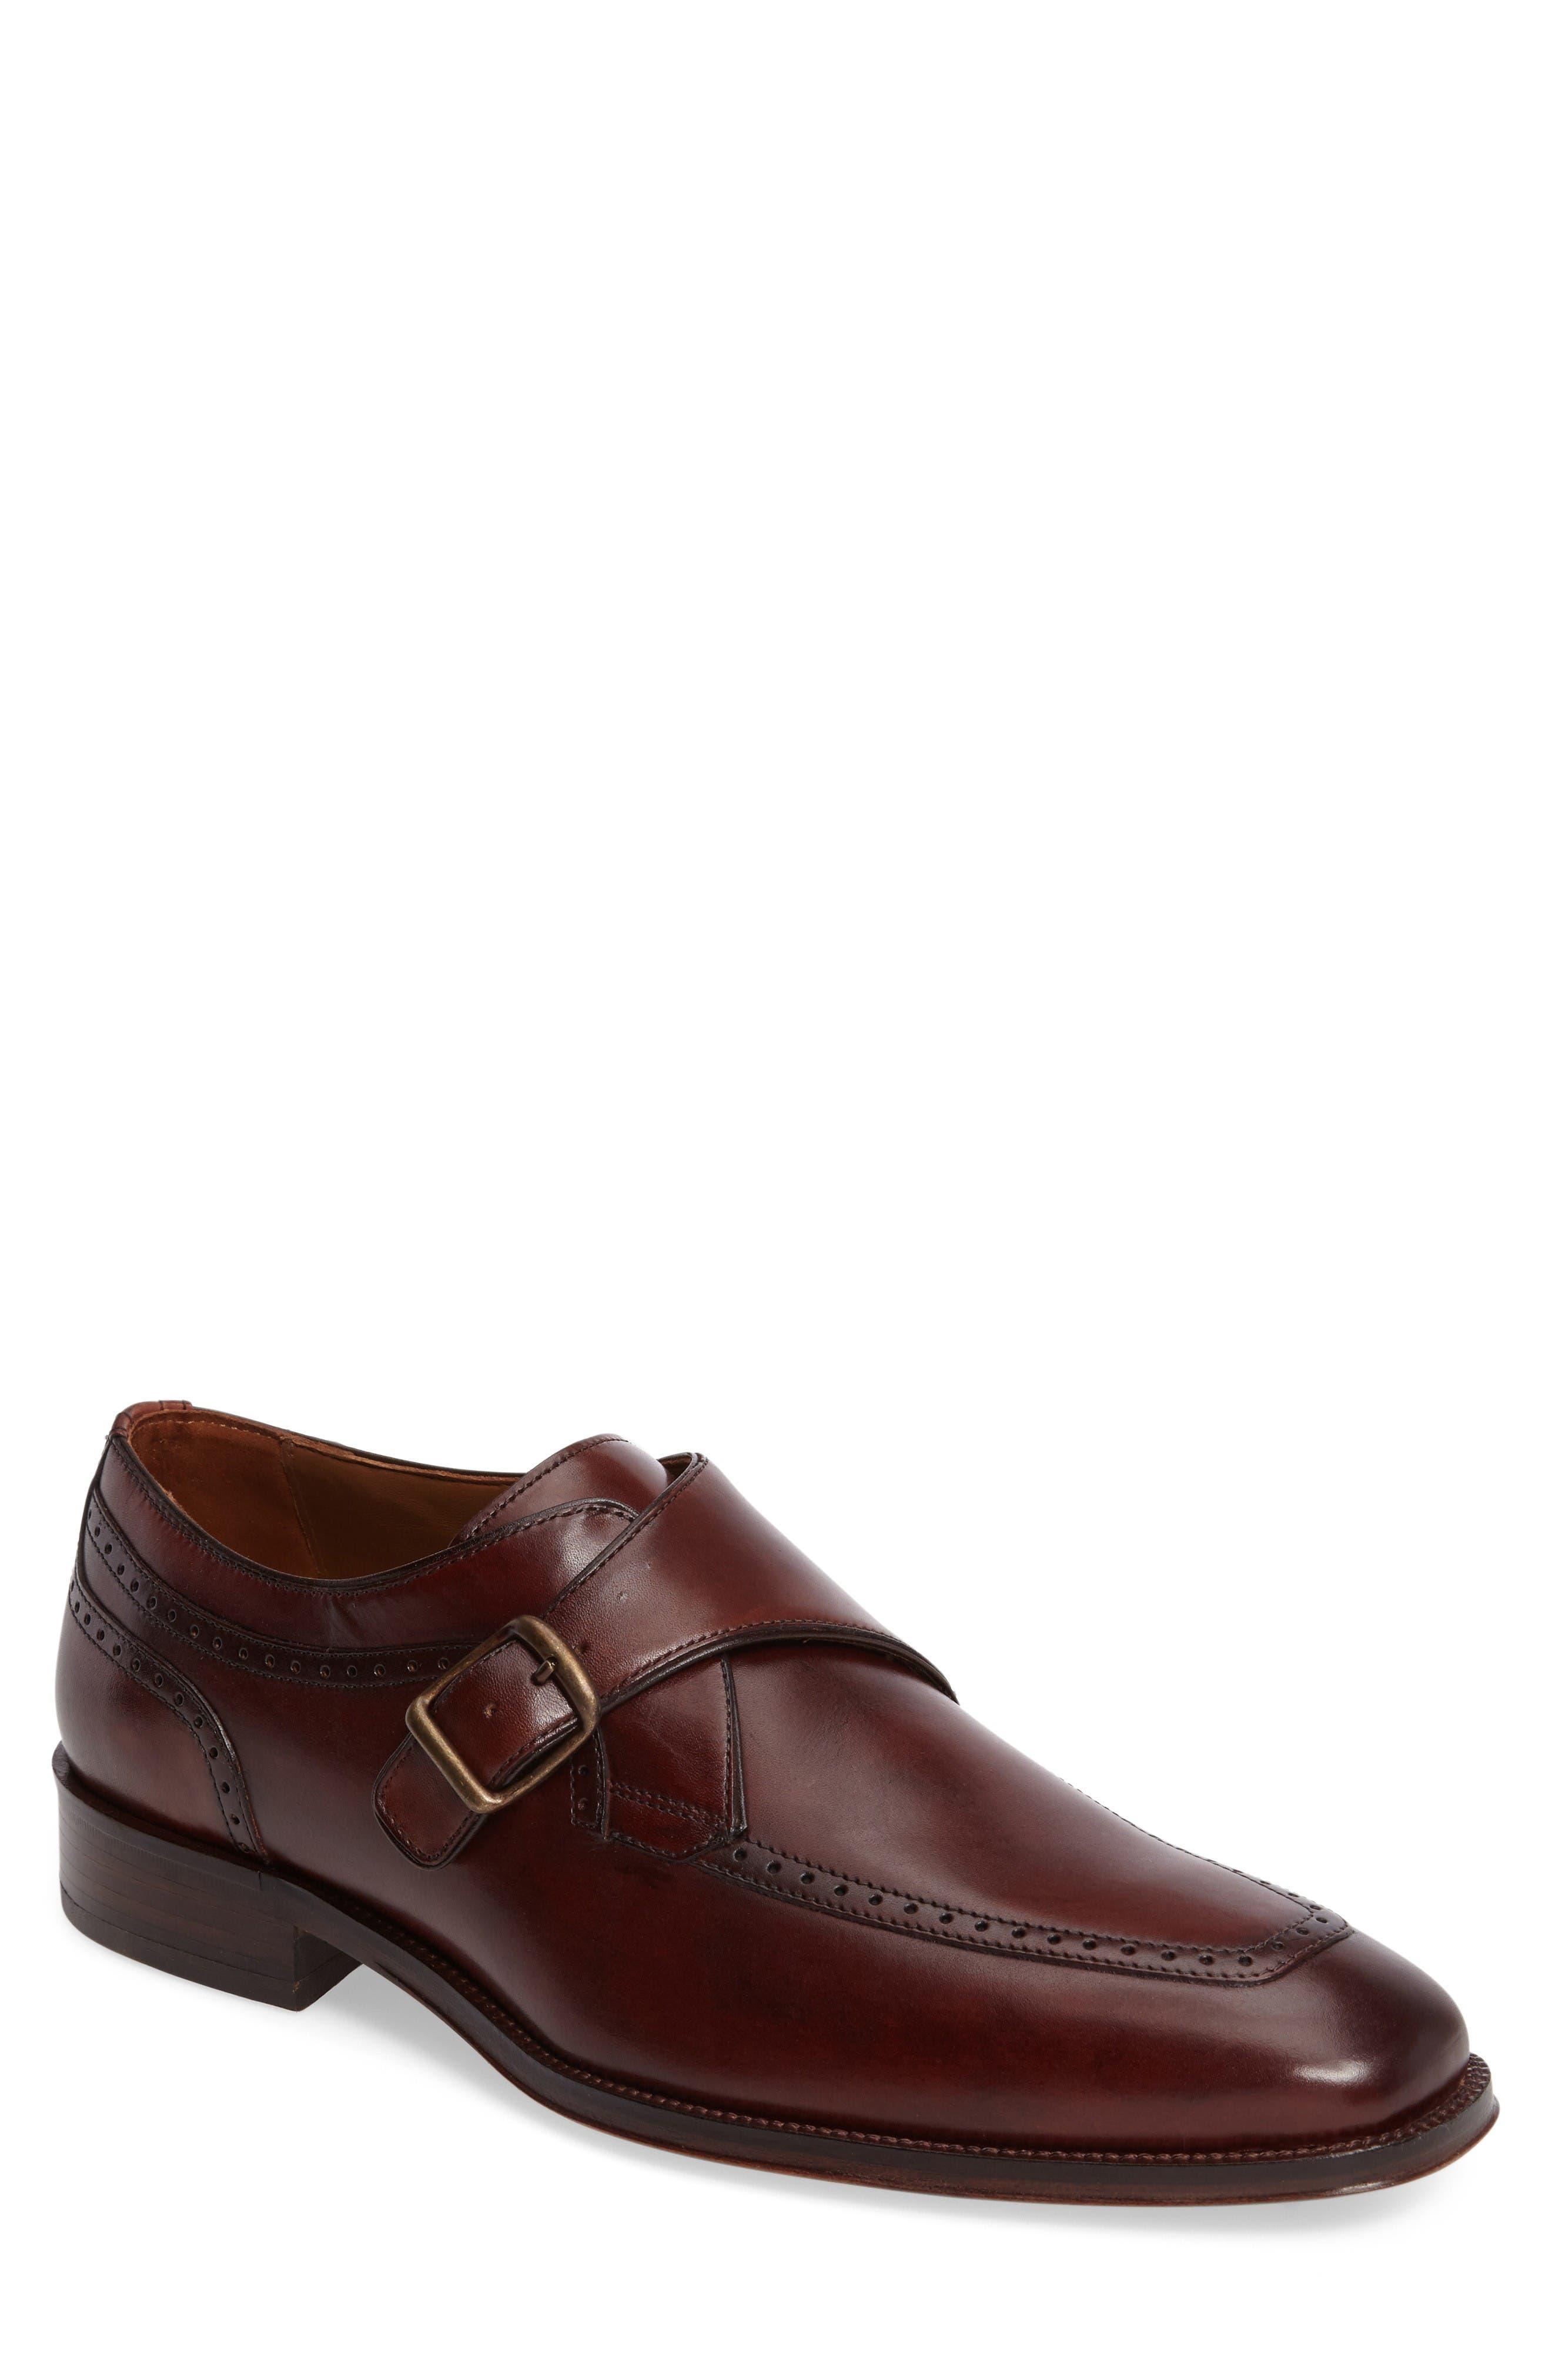 Main Image - Johnston & Murphy Boydstun Monk Strap Shoe (Men)